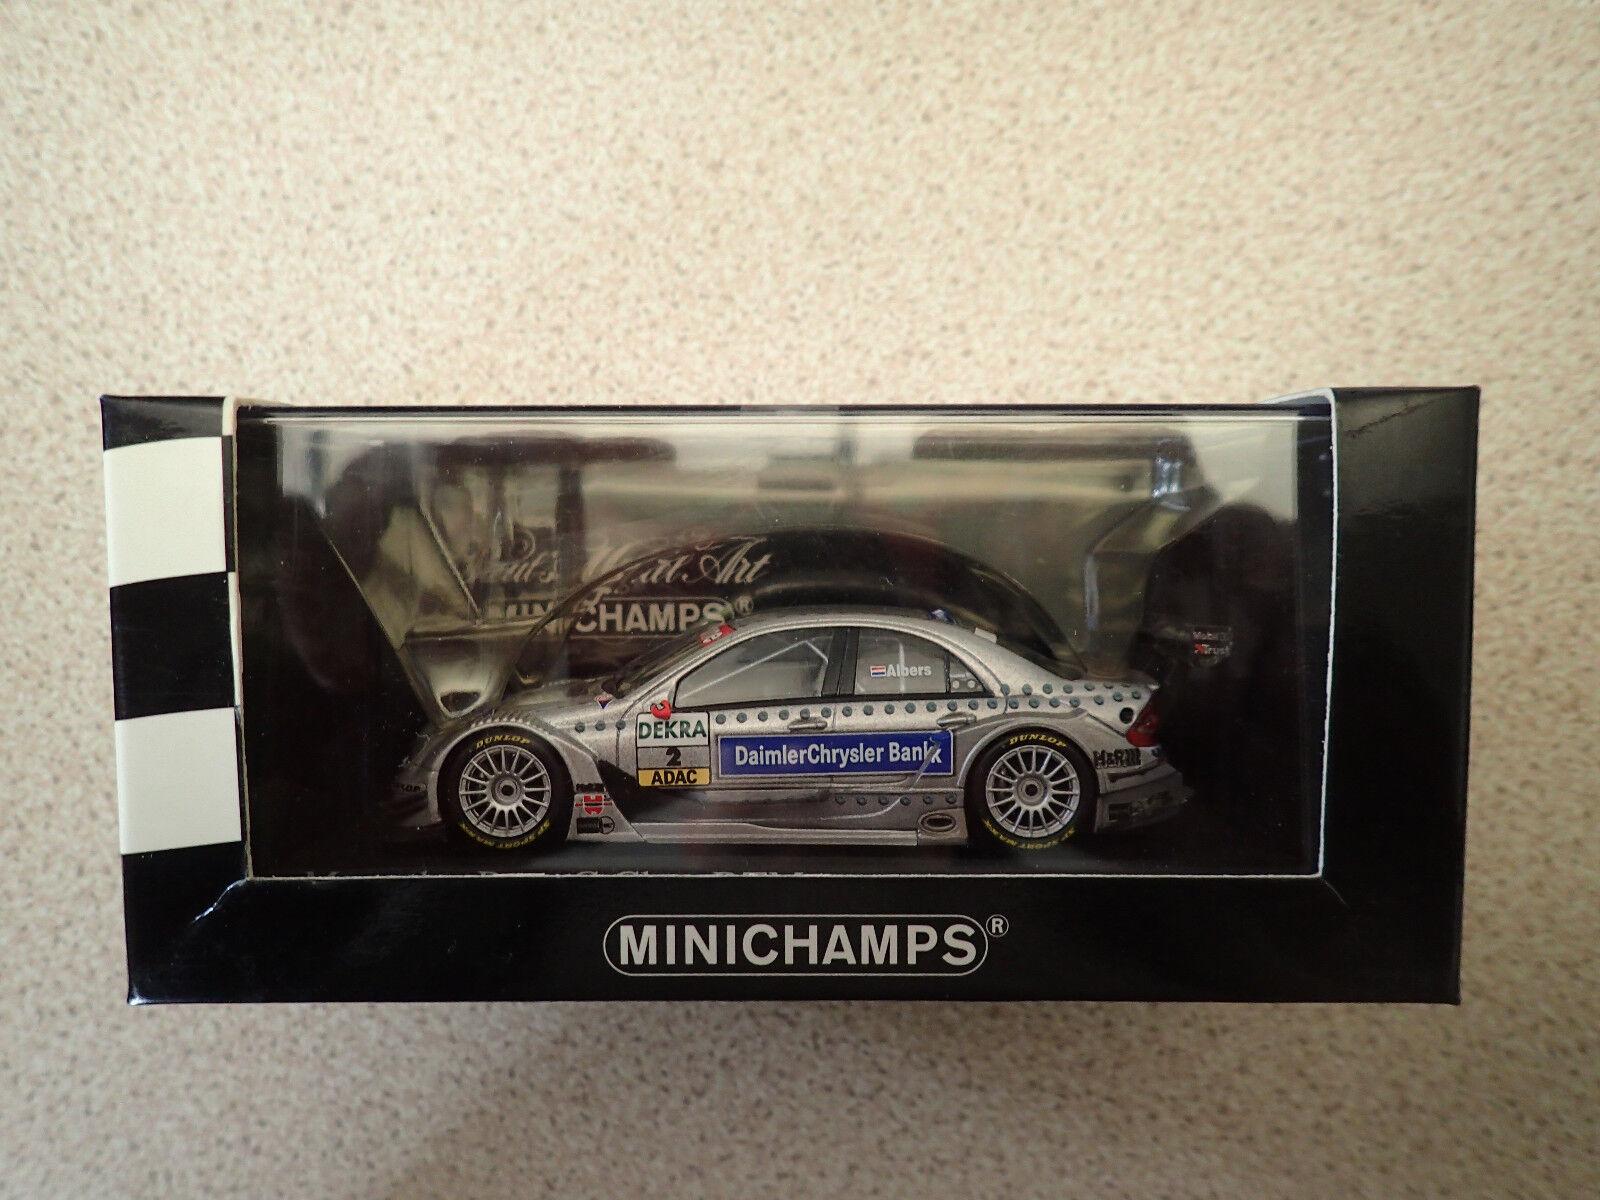 Ltd Edn Minichamps 1 43 400 043402 Mercedes C-Class DTM 2004 Team AMG